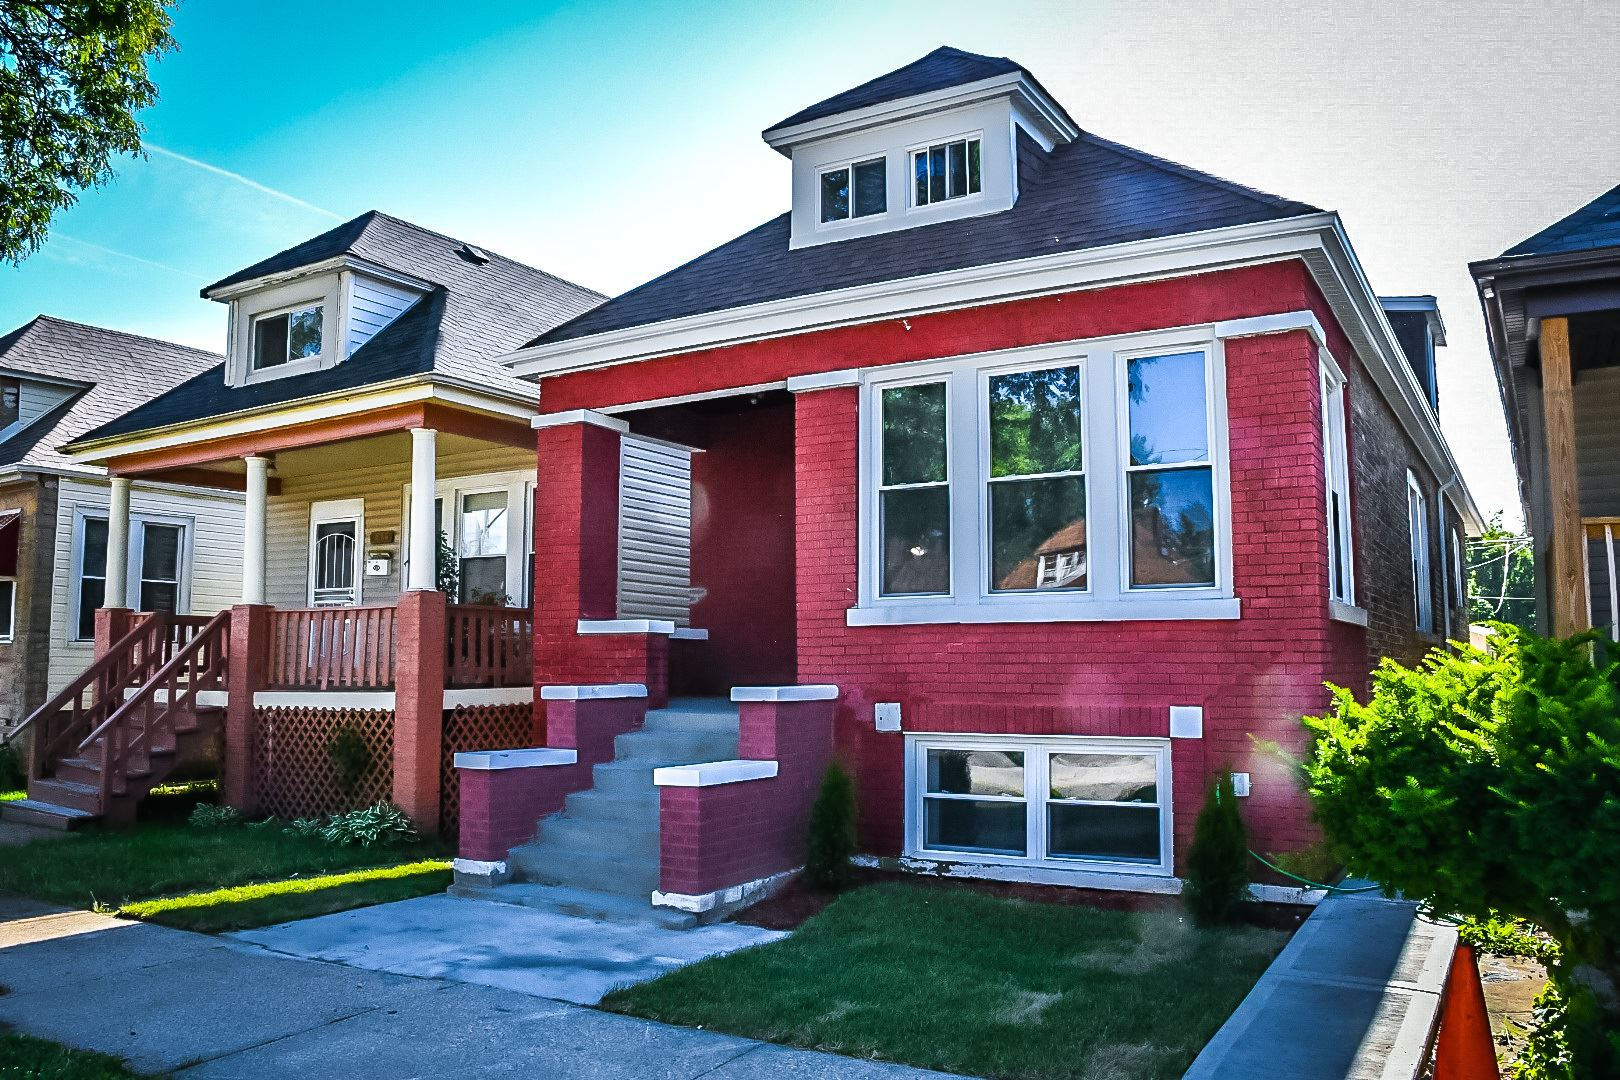 8421 S Green Street, Chicago, IL 60620 - MLS#: 10747751